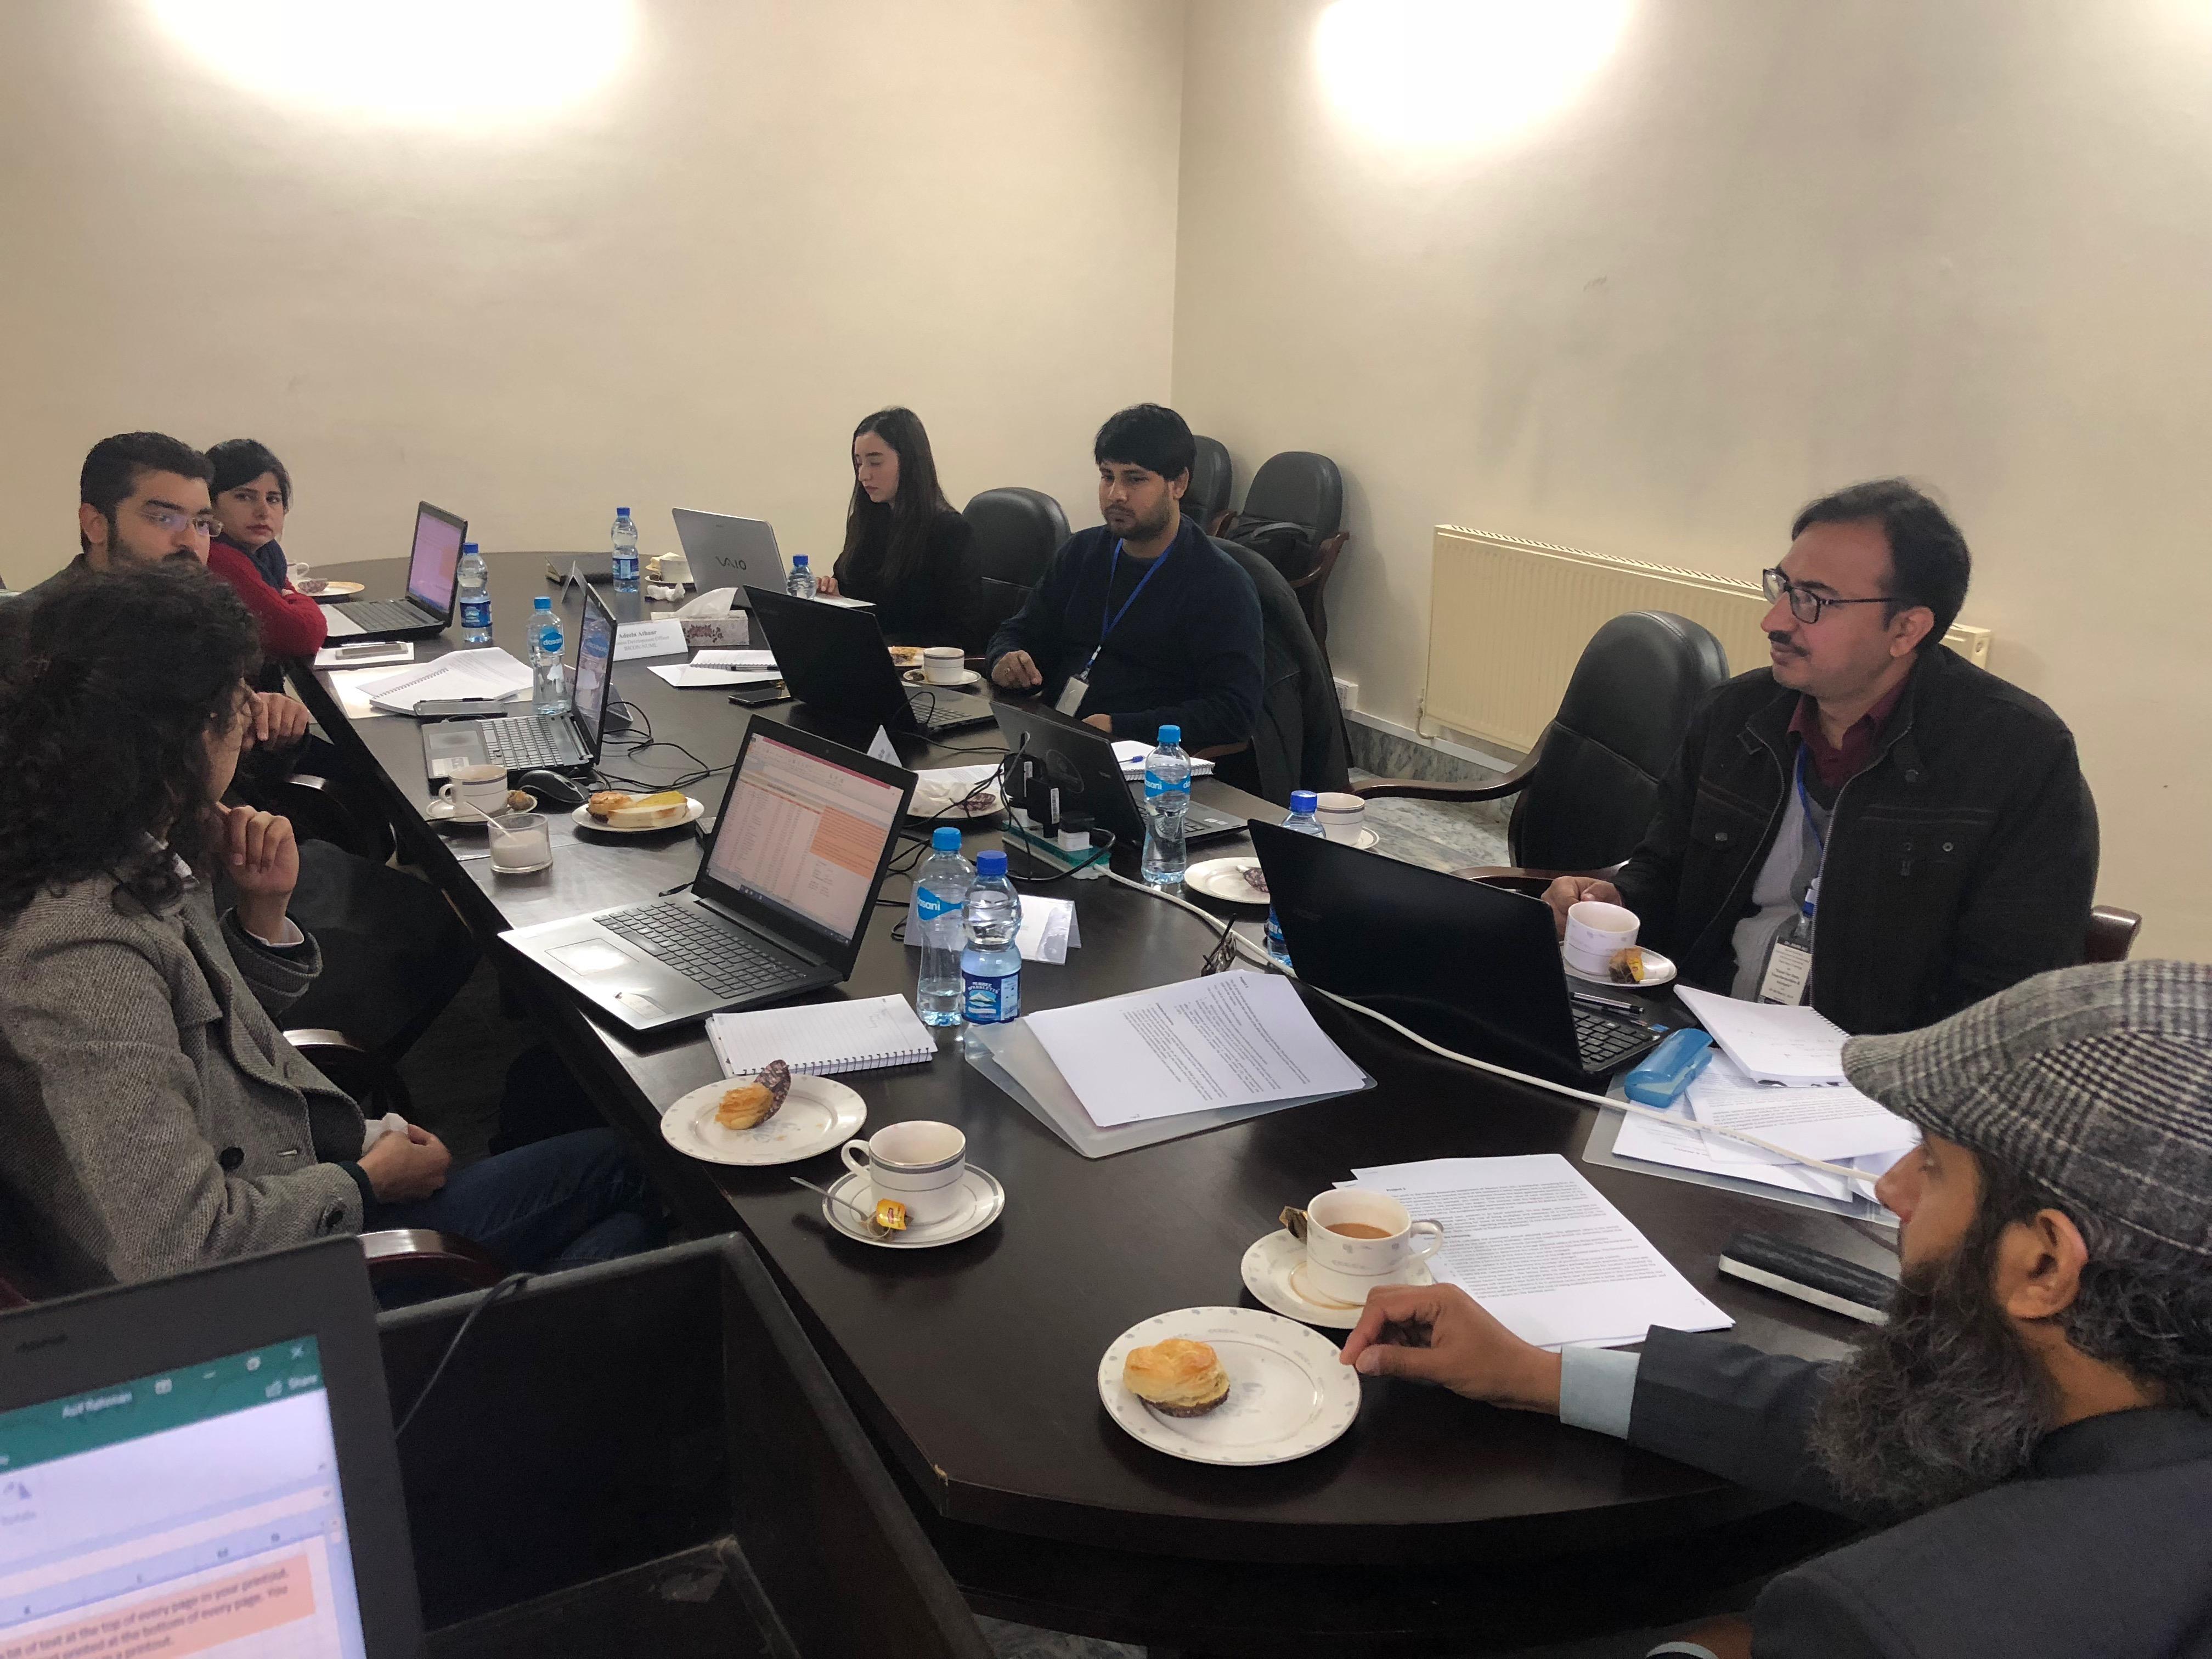 Microsoft Excel workshop on Data Transformation & Analysis